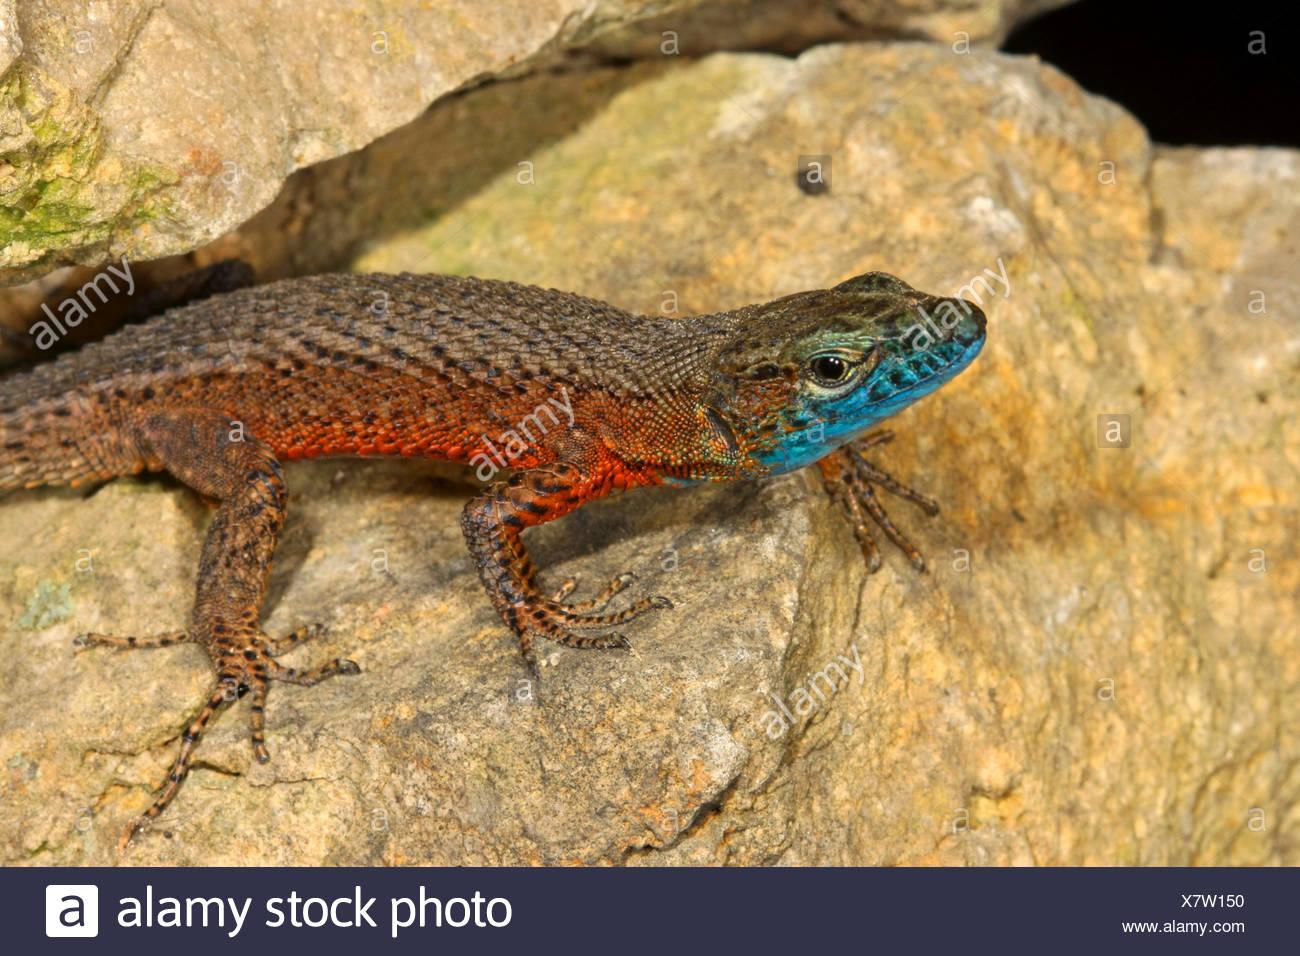 Blue-throated keeled lizard, Dalmatian Algyroides (Algyroides nigropunctatus), male on stones - Stock Image